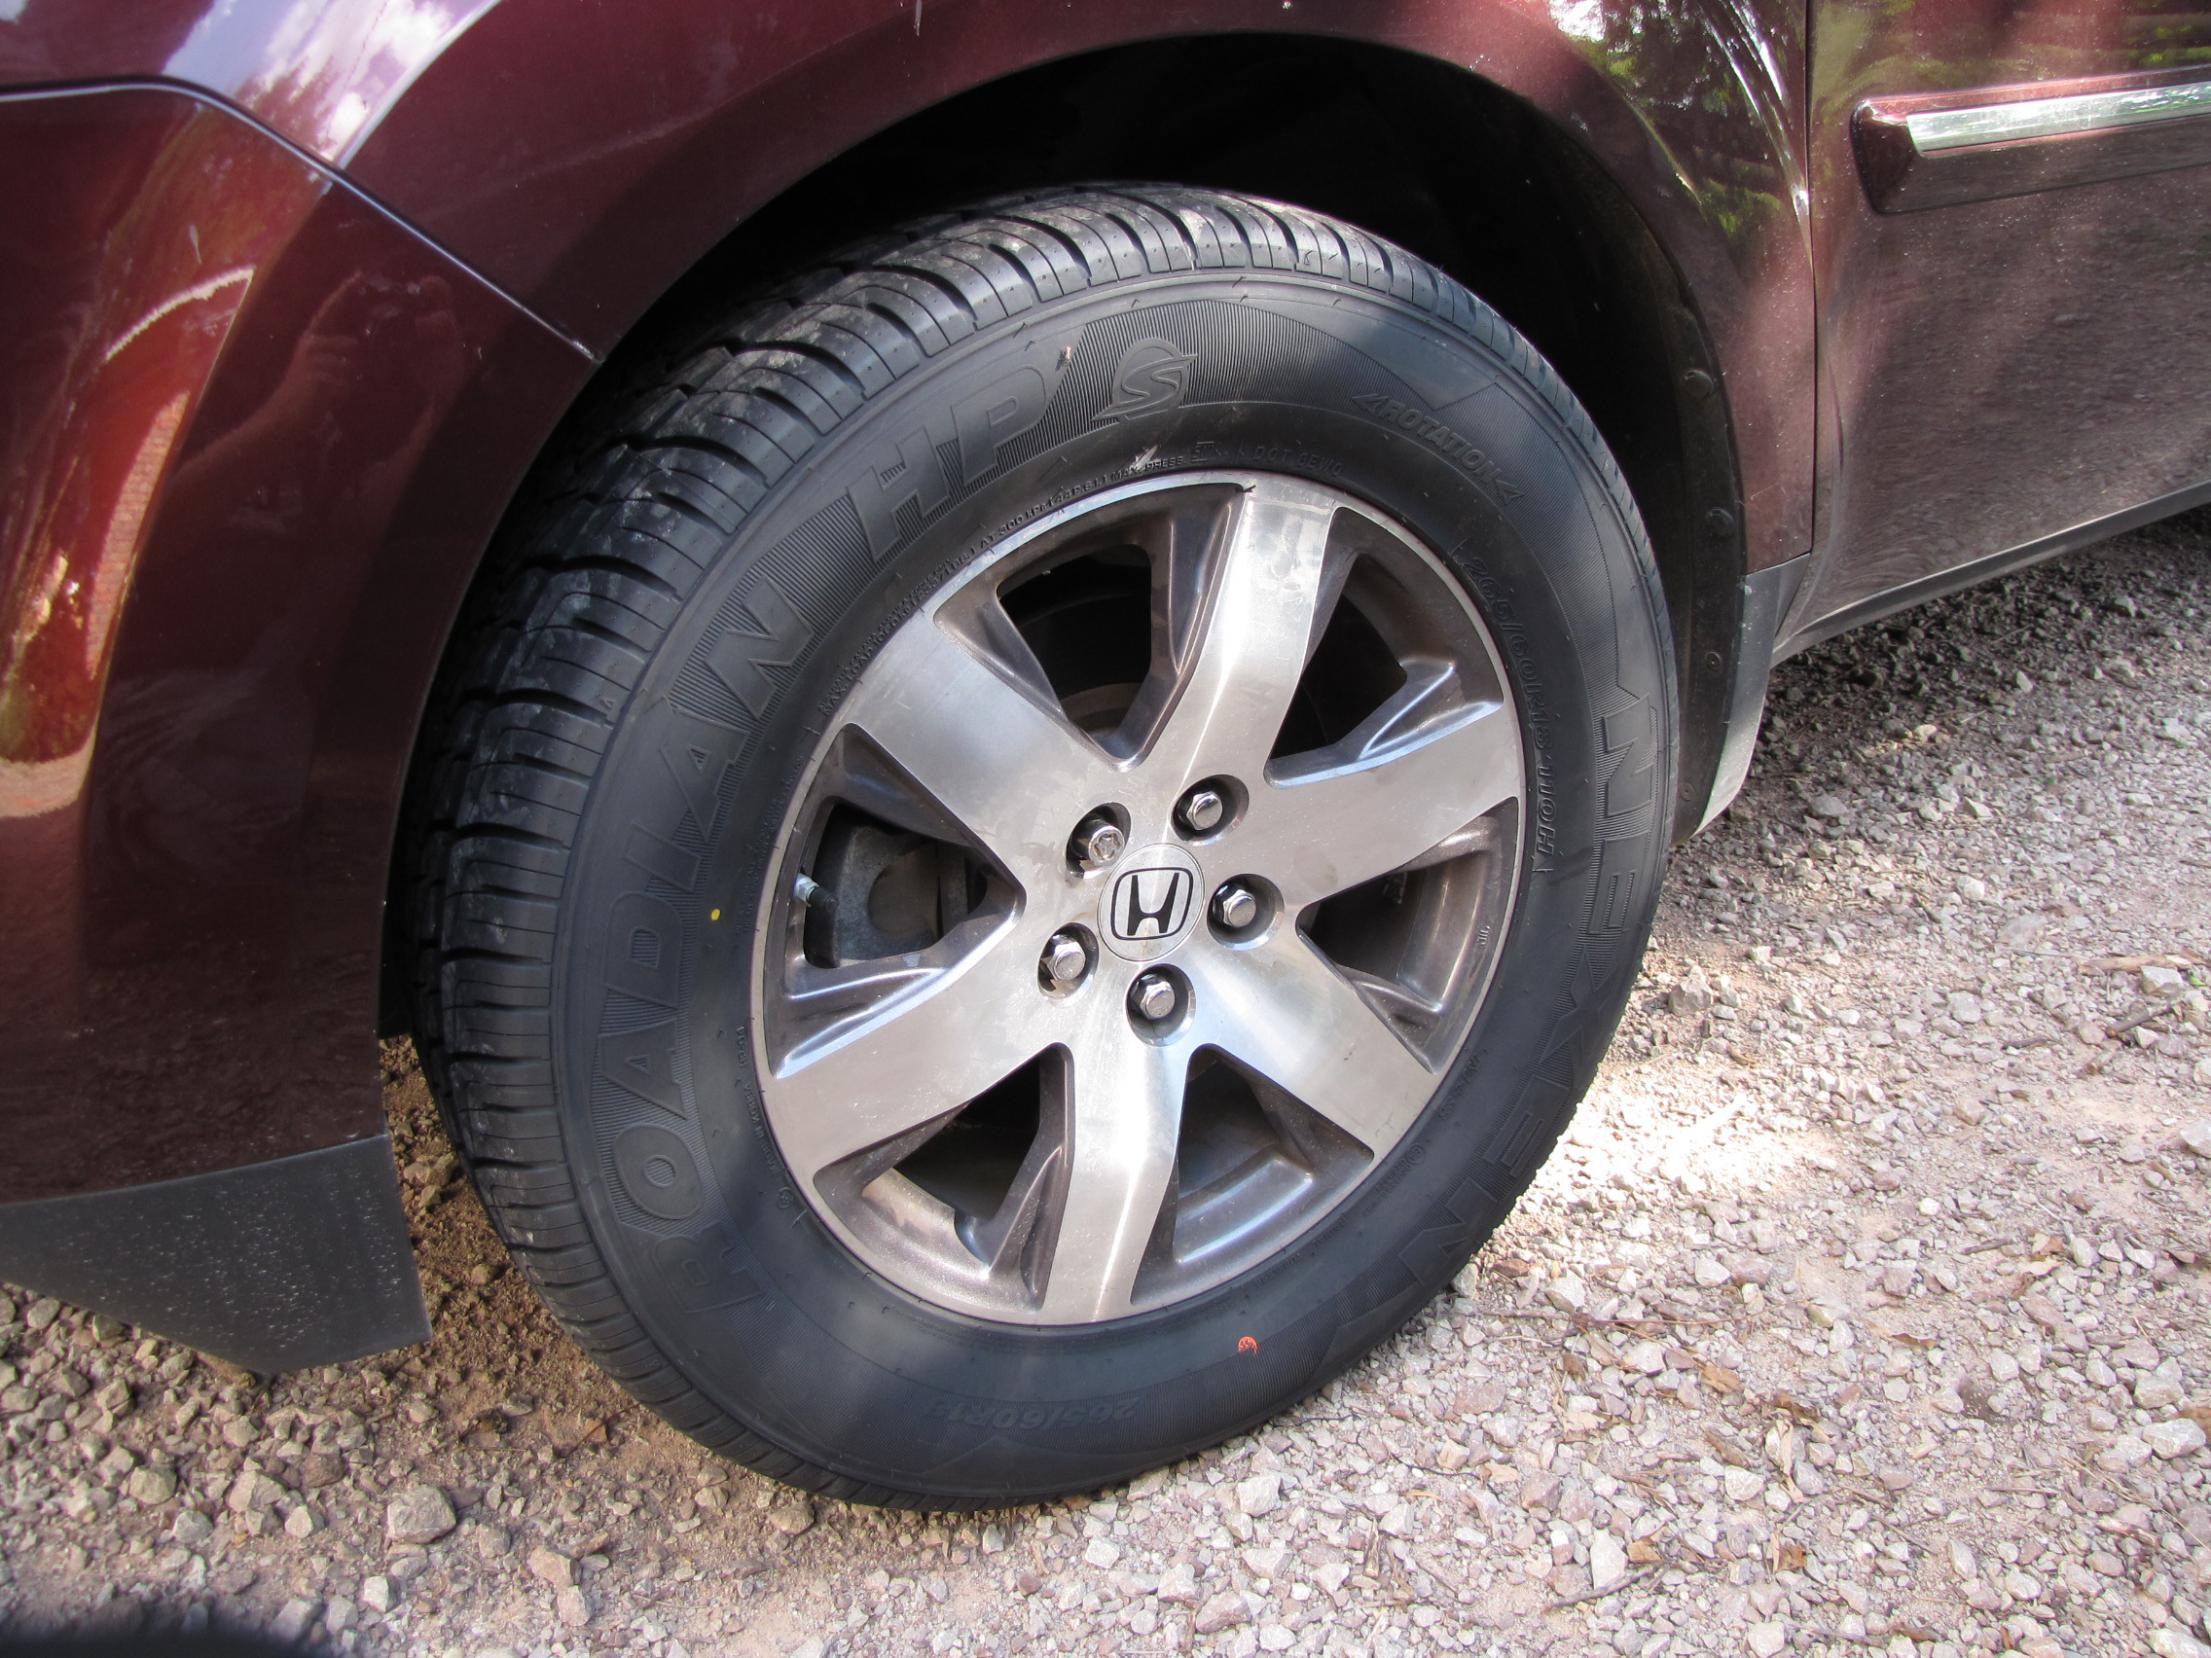 265/60R-18 Nexen Rodian HP Tires on Honda OEM 2012 Pilot Wheels DO fit! - Honda Pilot - Honda ...